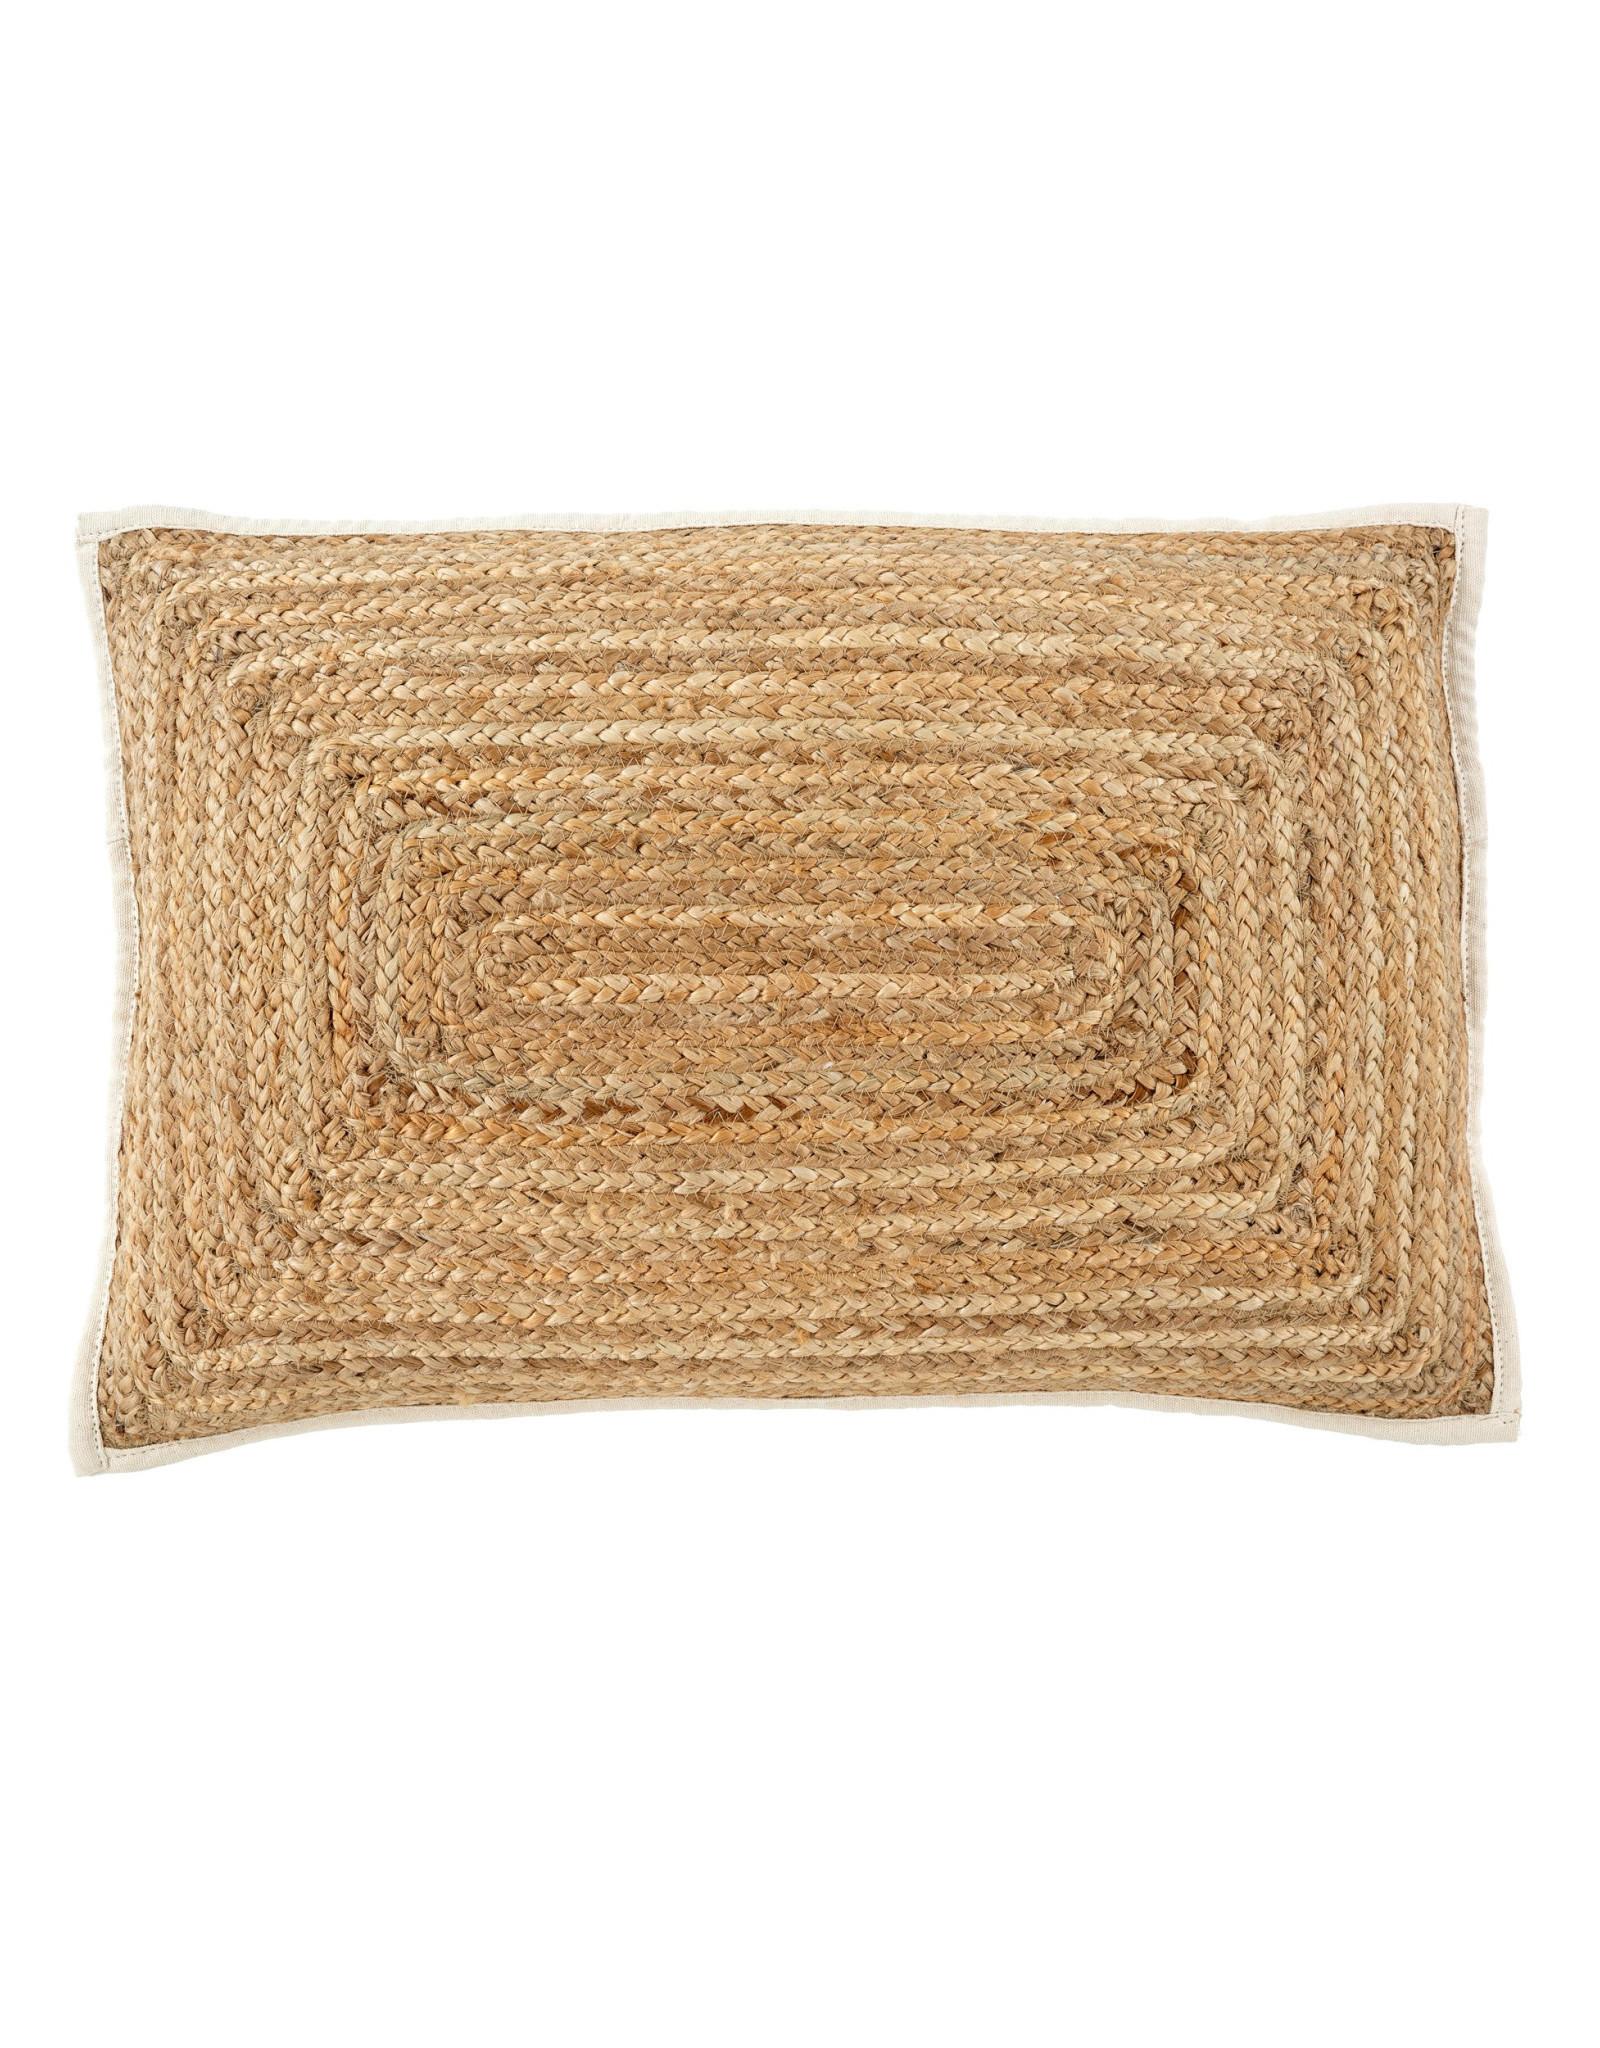 Indaba Monaco Lumbar Pillow - Jute